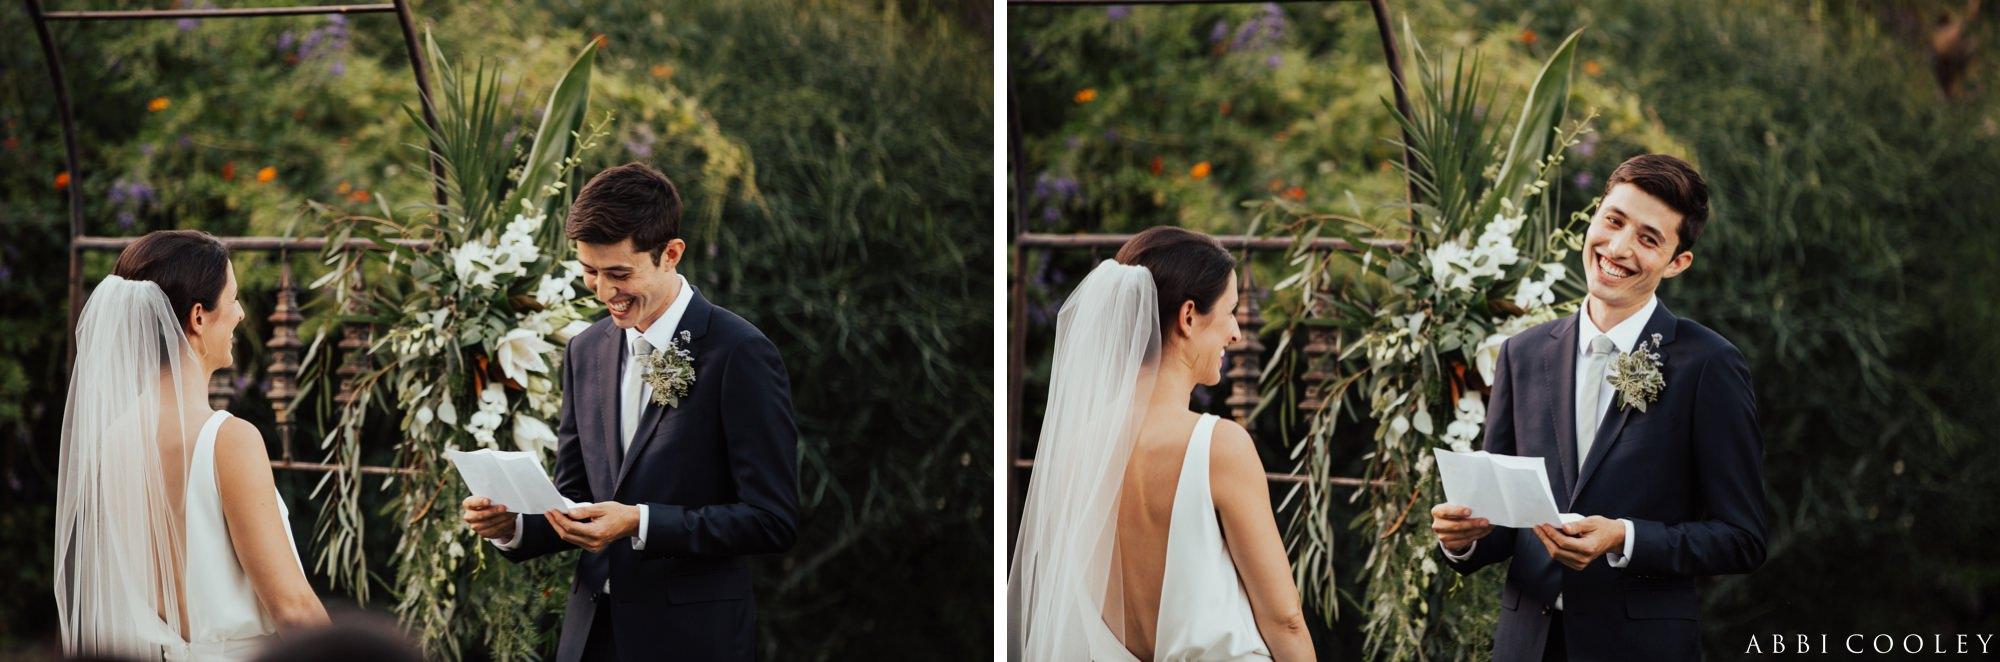 ABBI COOLEY PALM SPRINGS WEDDING_0804